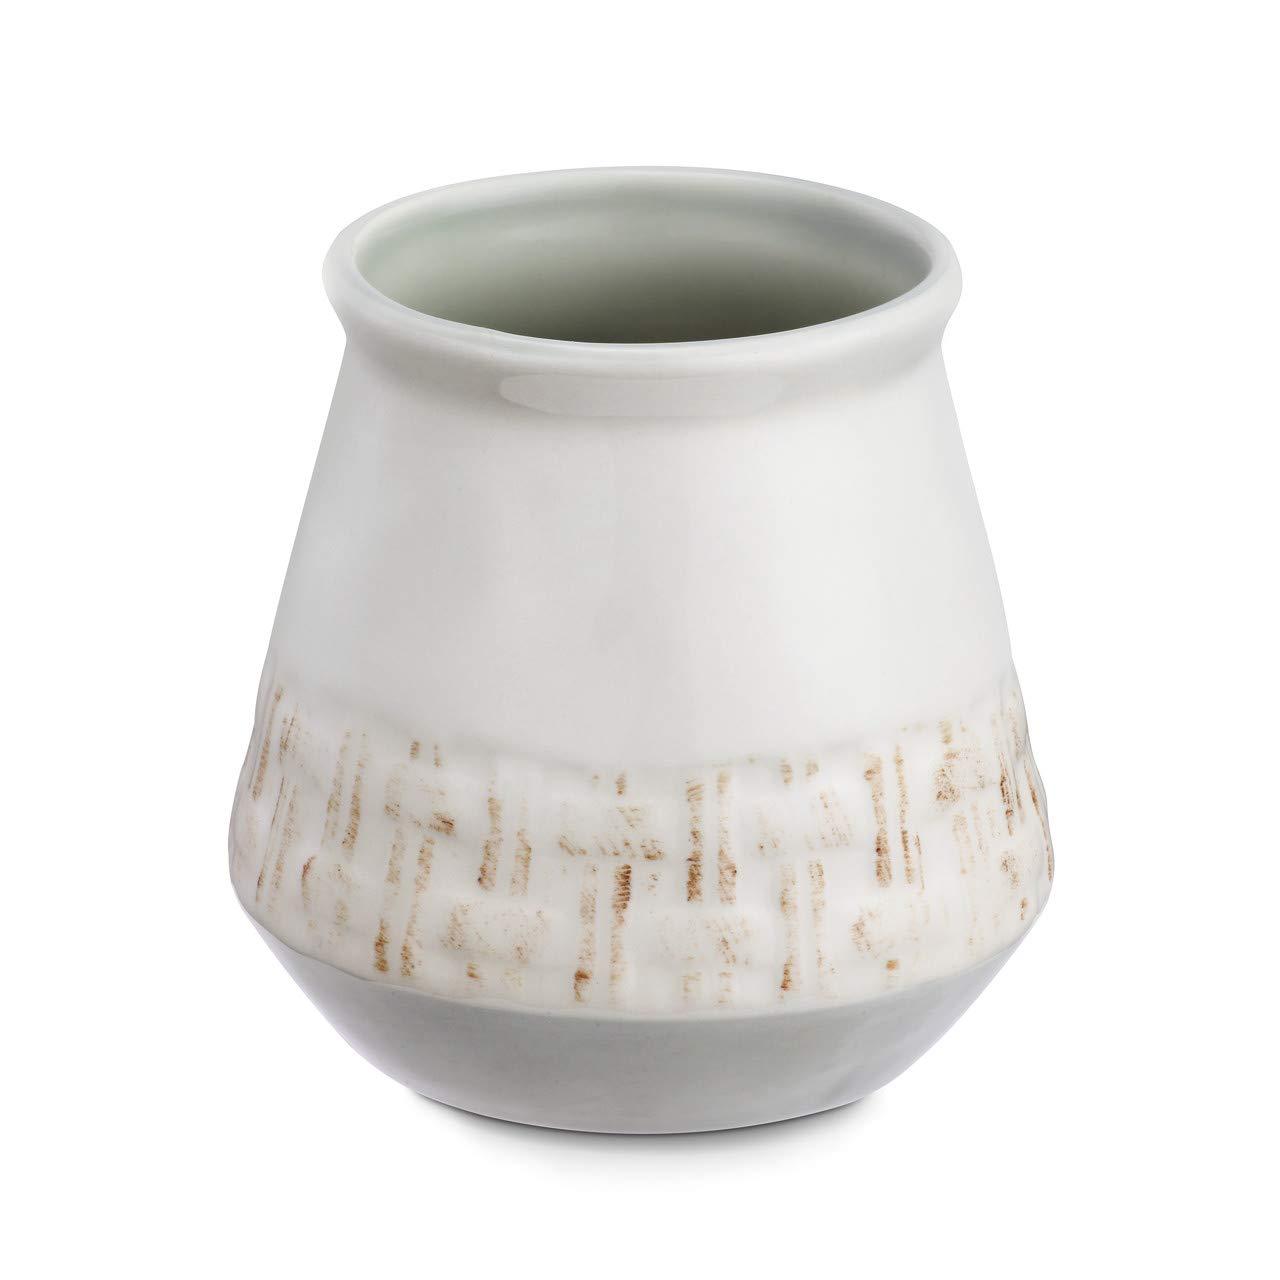 Woven Home Memories Glossy White 4 x 4 Ceramic Stoneware Kitchen Utensil Crock by DEMDACO